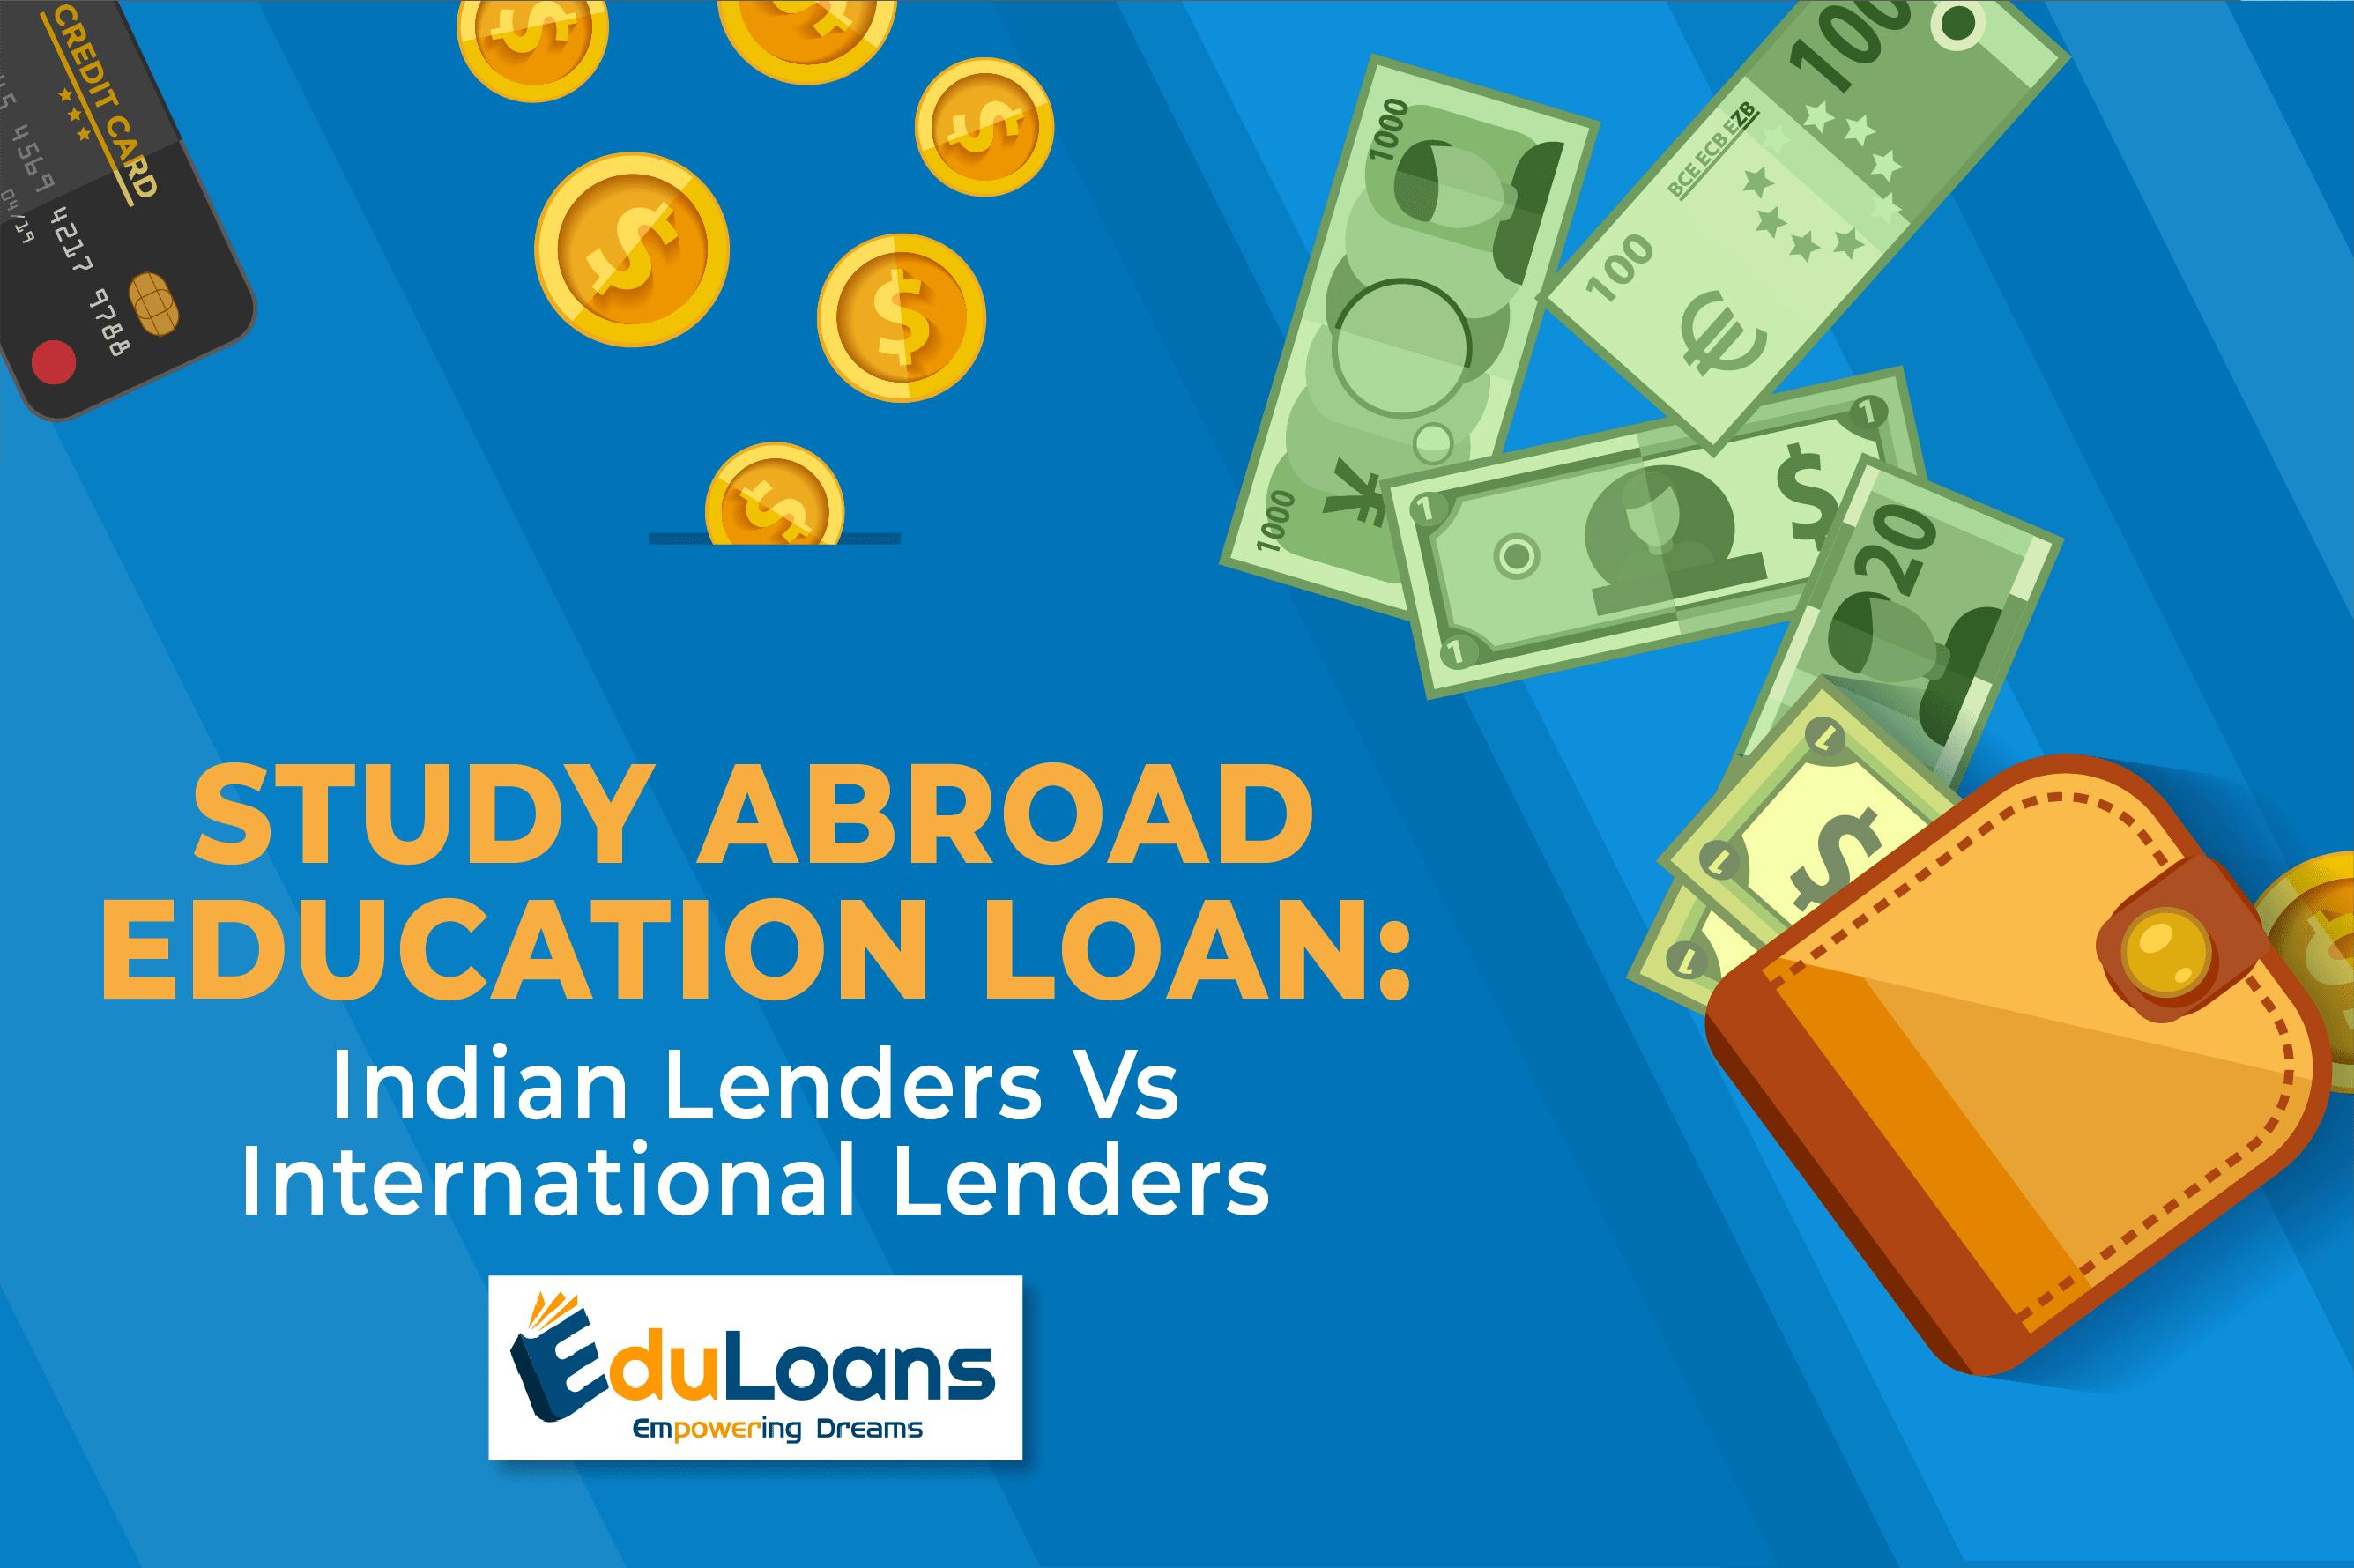 Study Abroad Education Loan: Indian Lenders Vs International Lenders